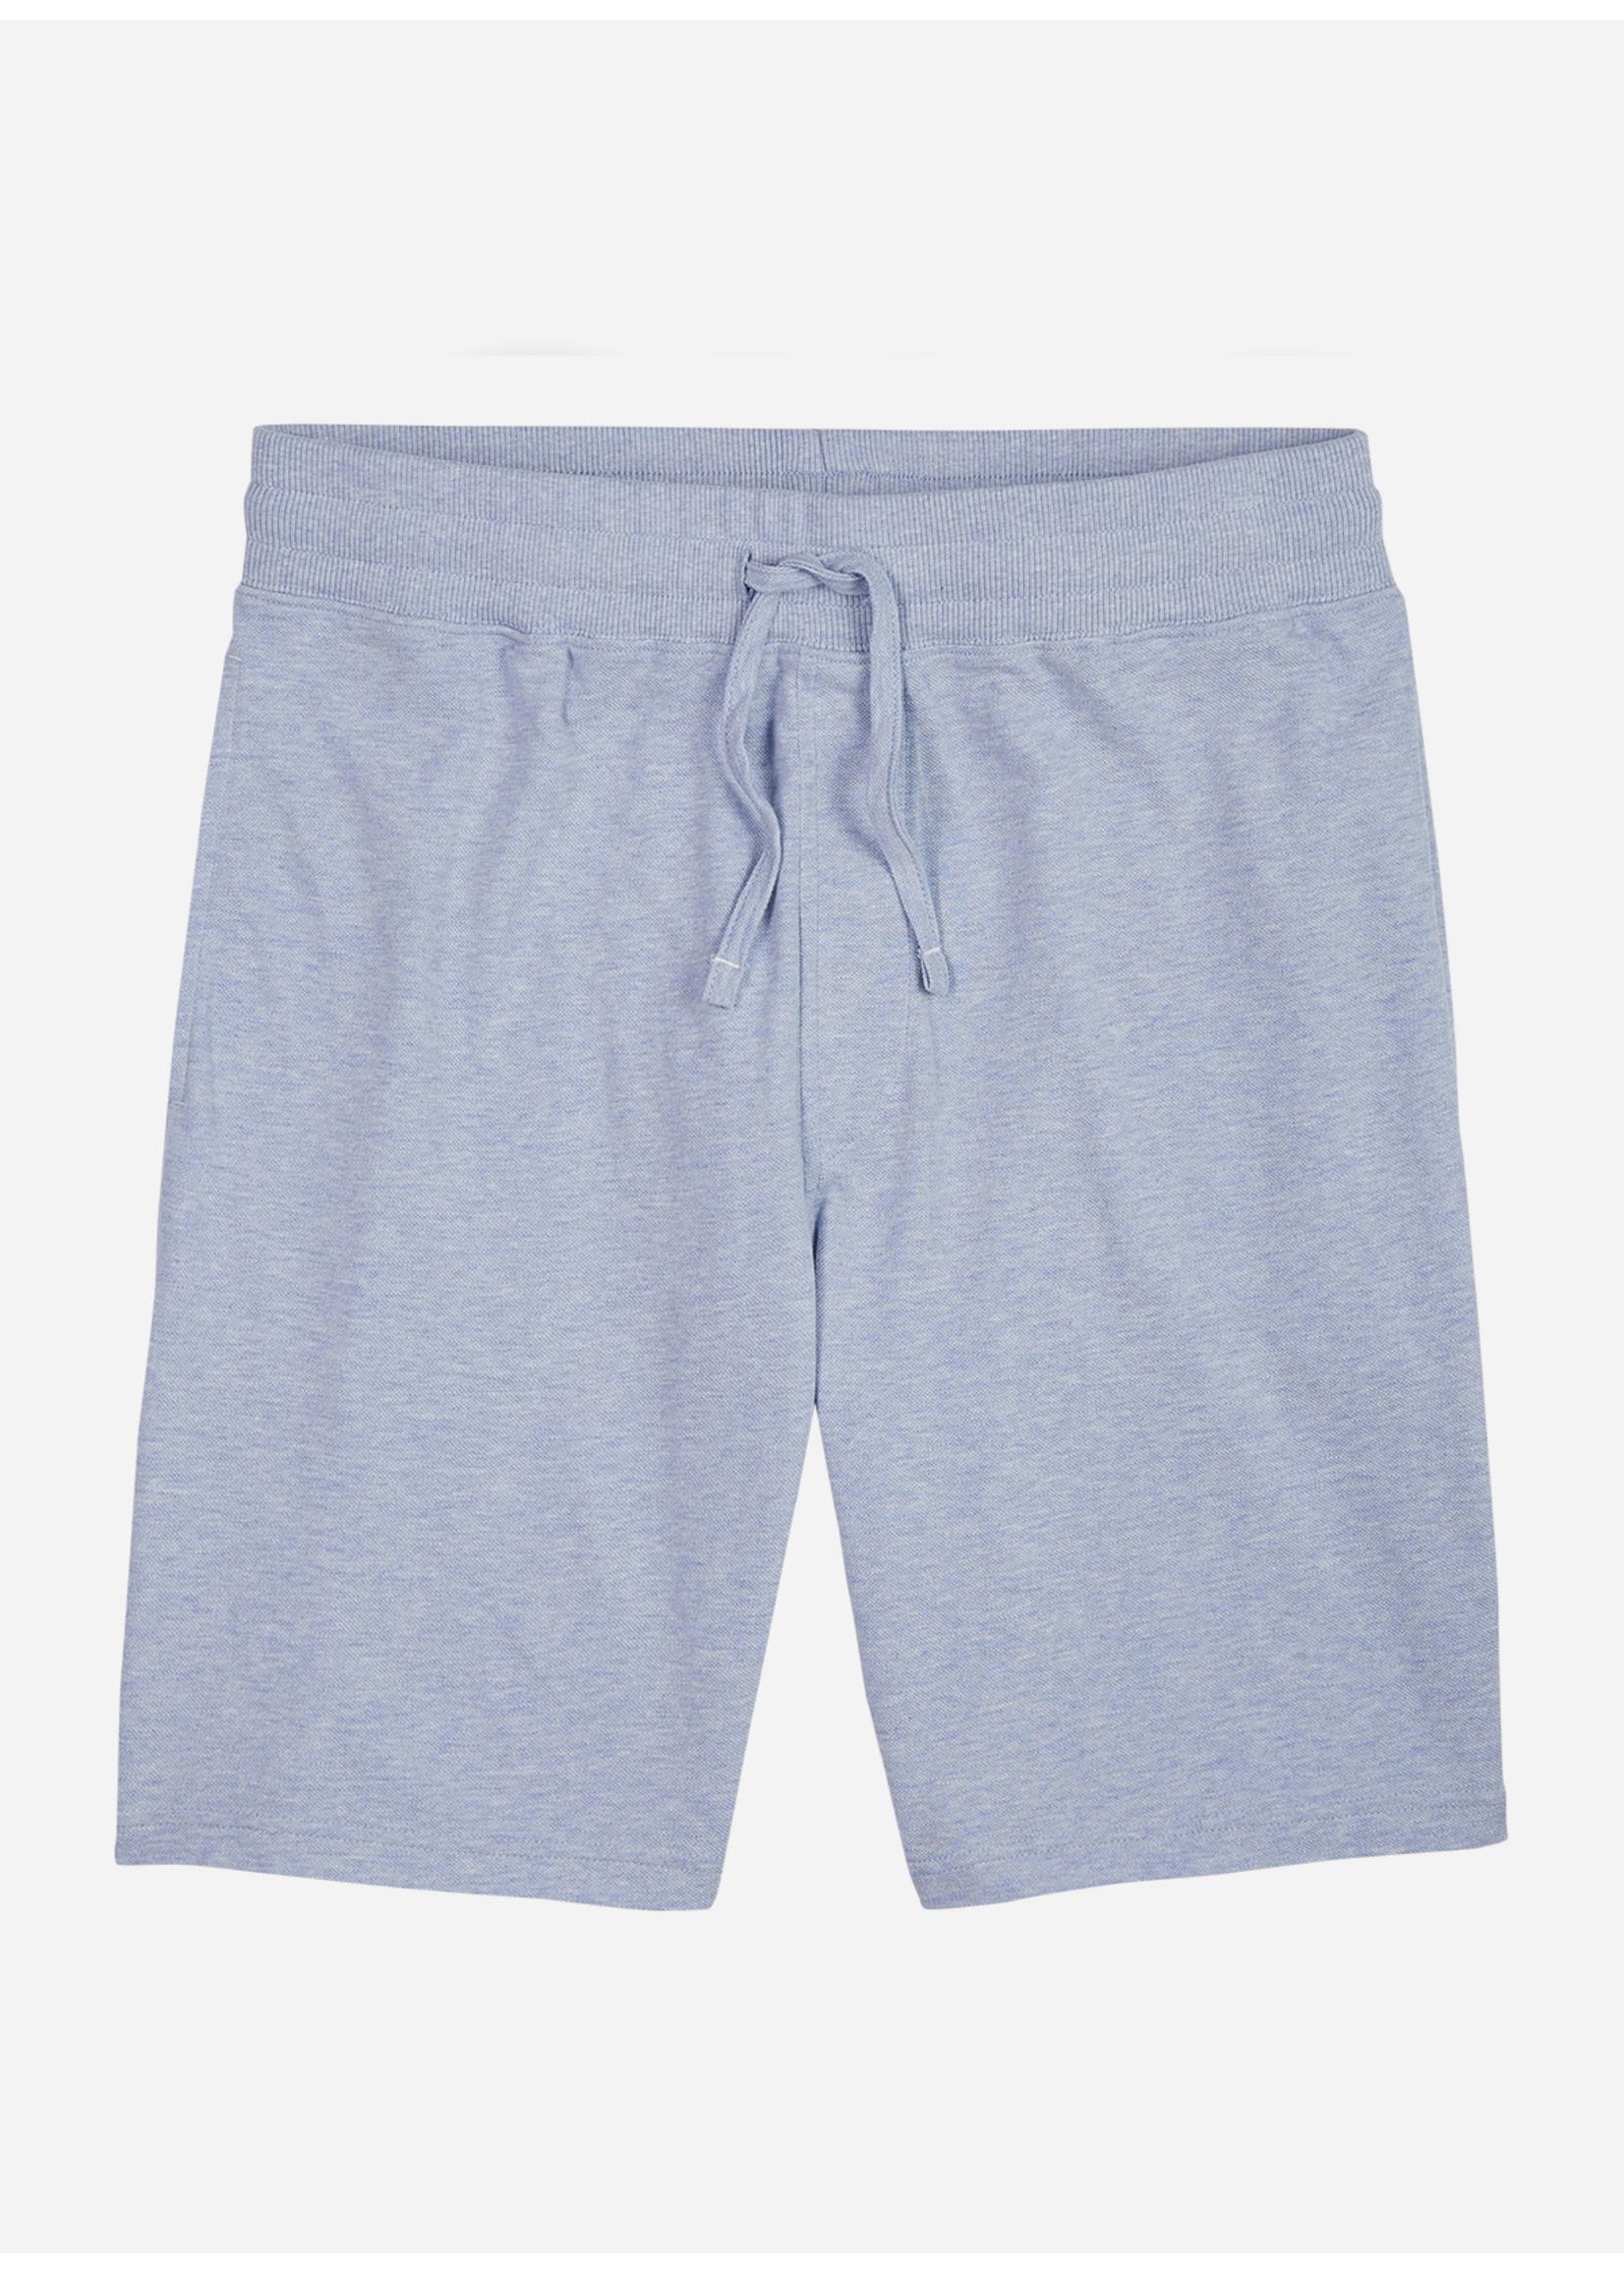 Wahts Key pique shorts light blue melange